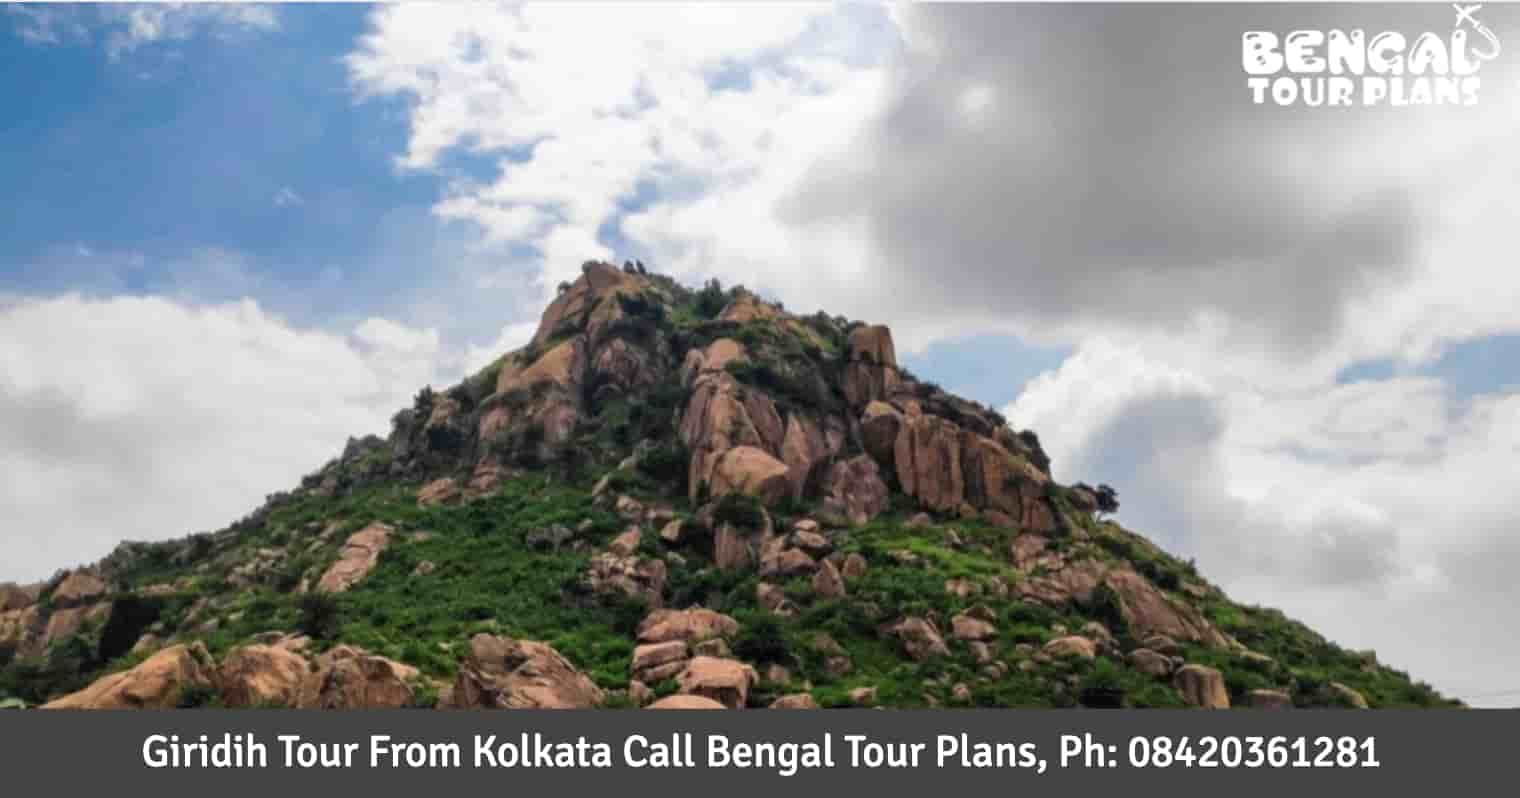 Giridih Tour Package From Kolkata